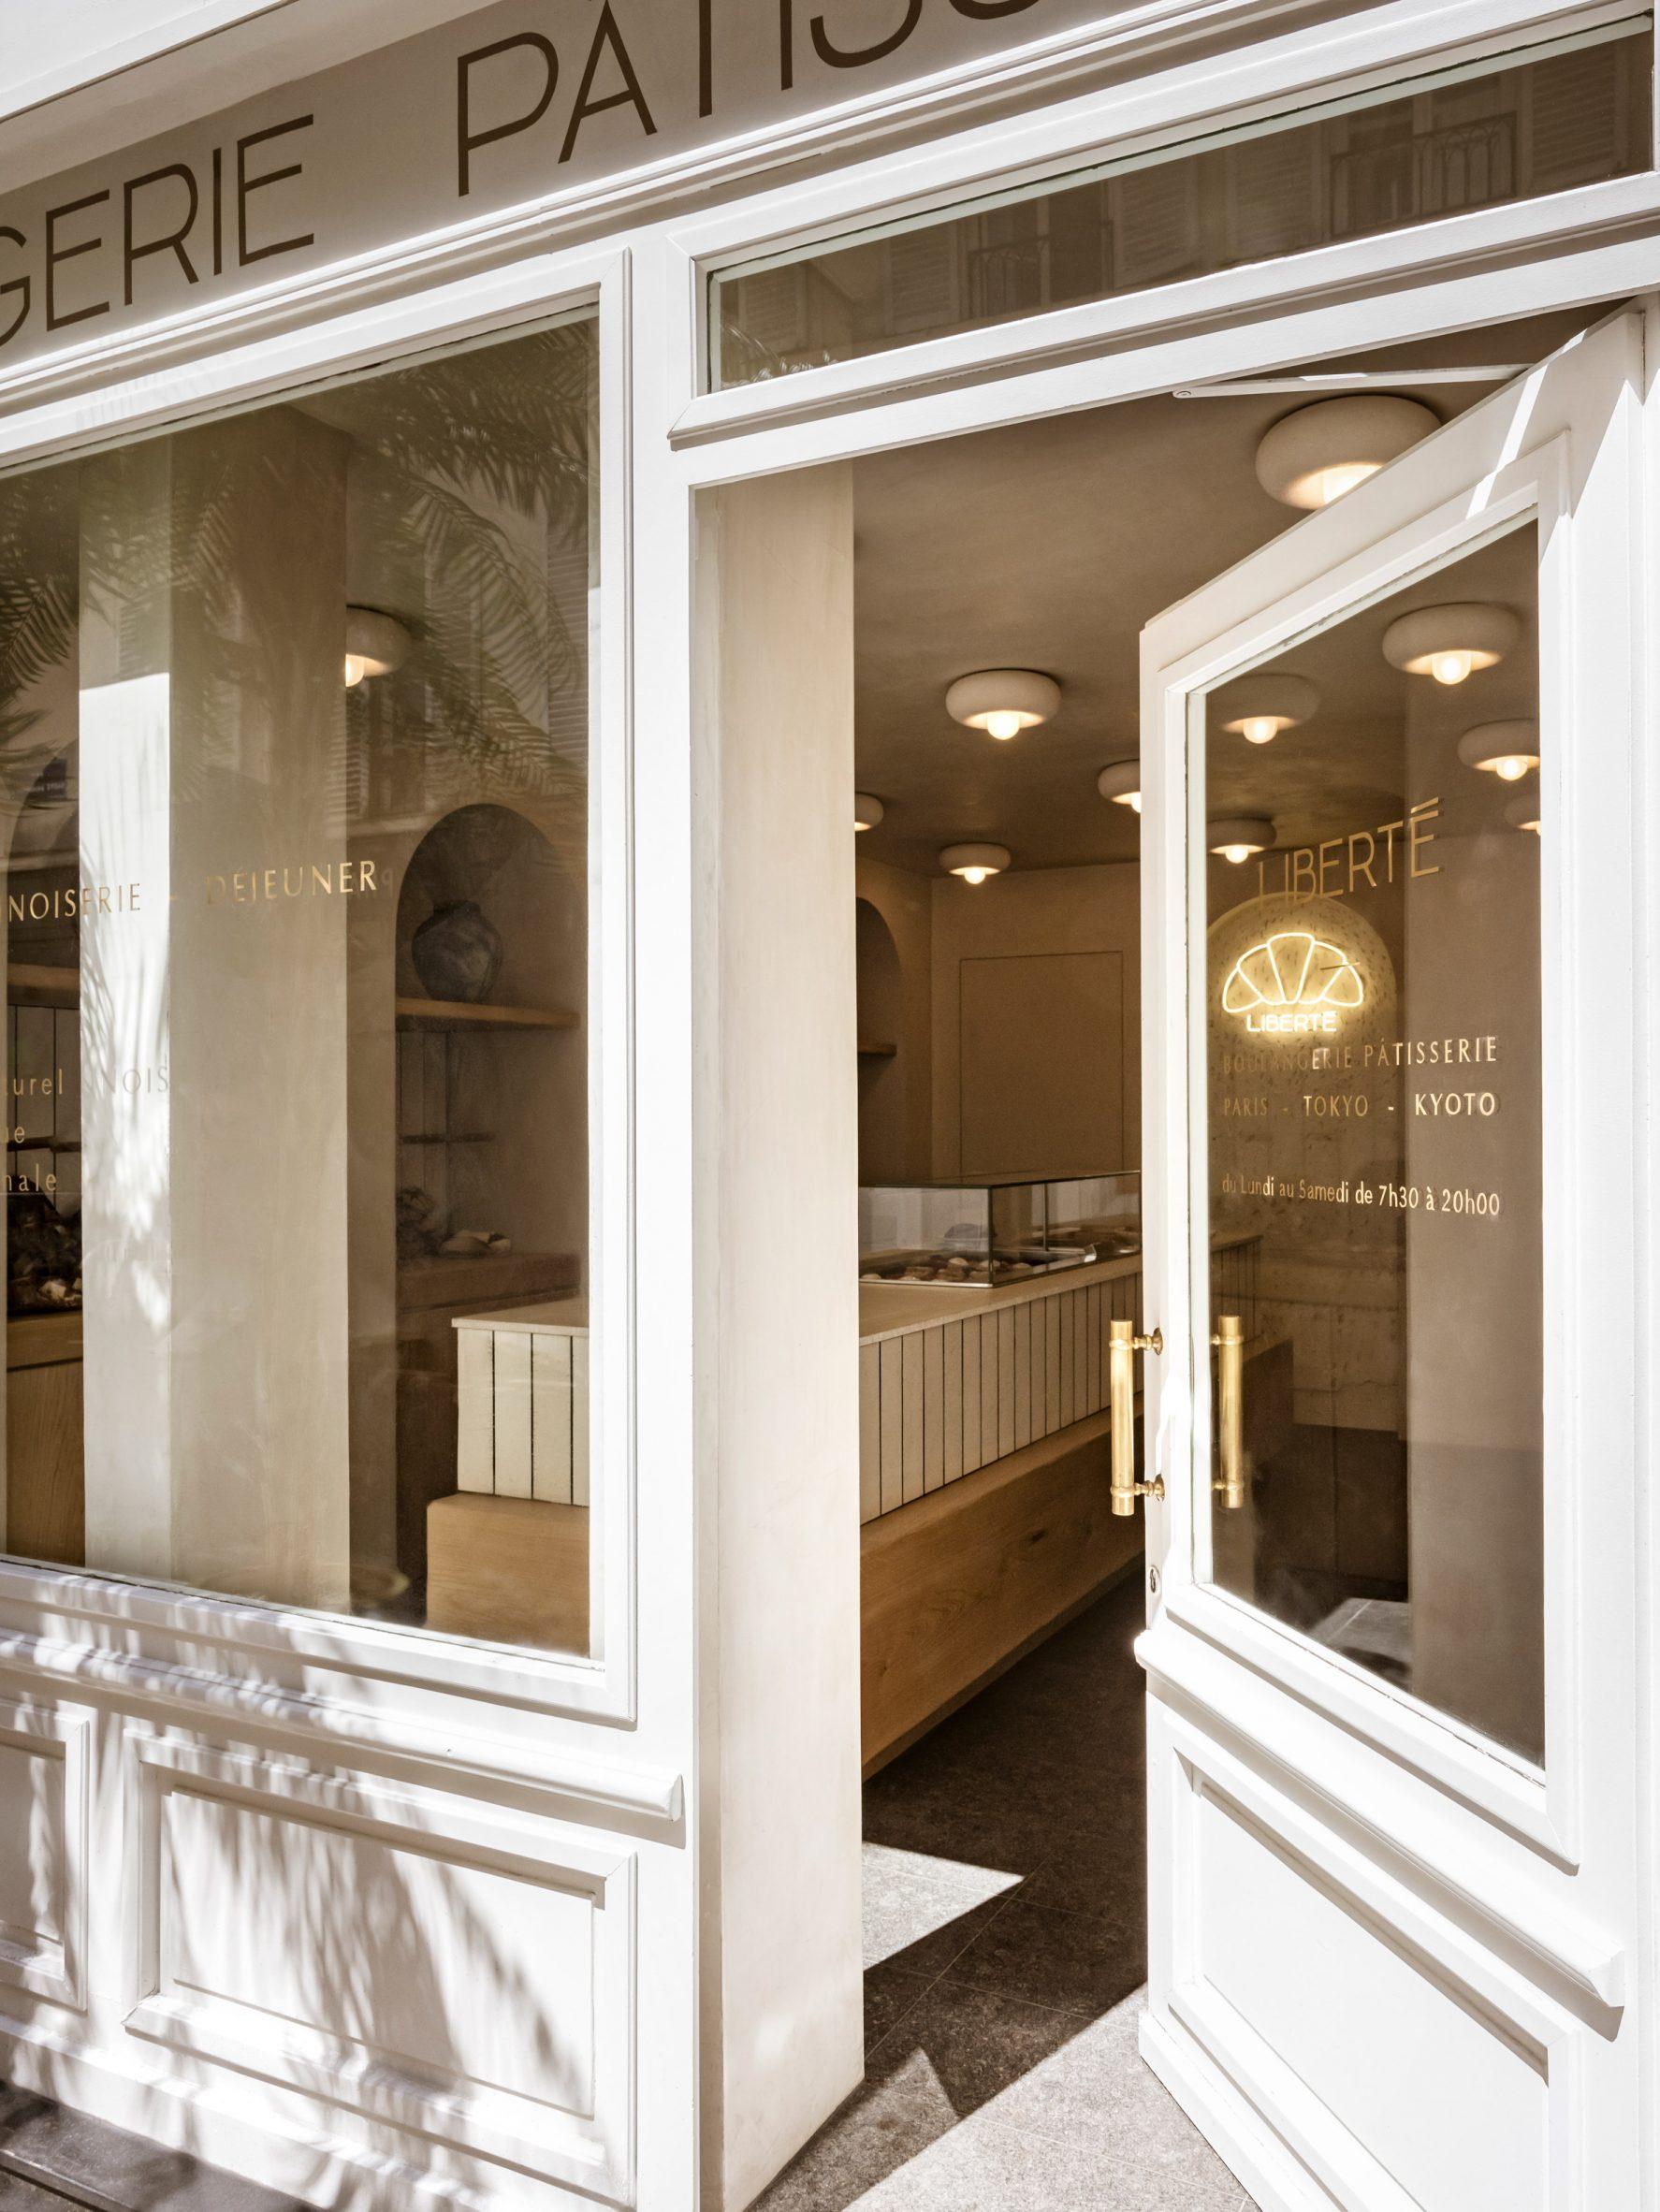 Libertébakery in Paris